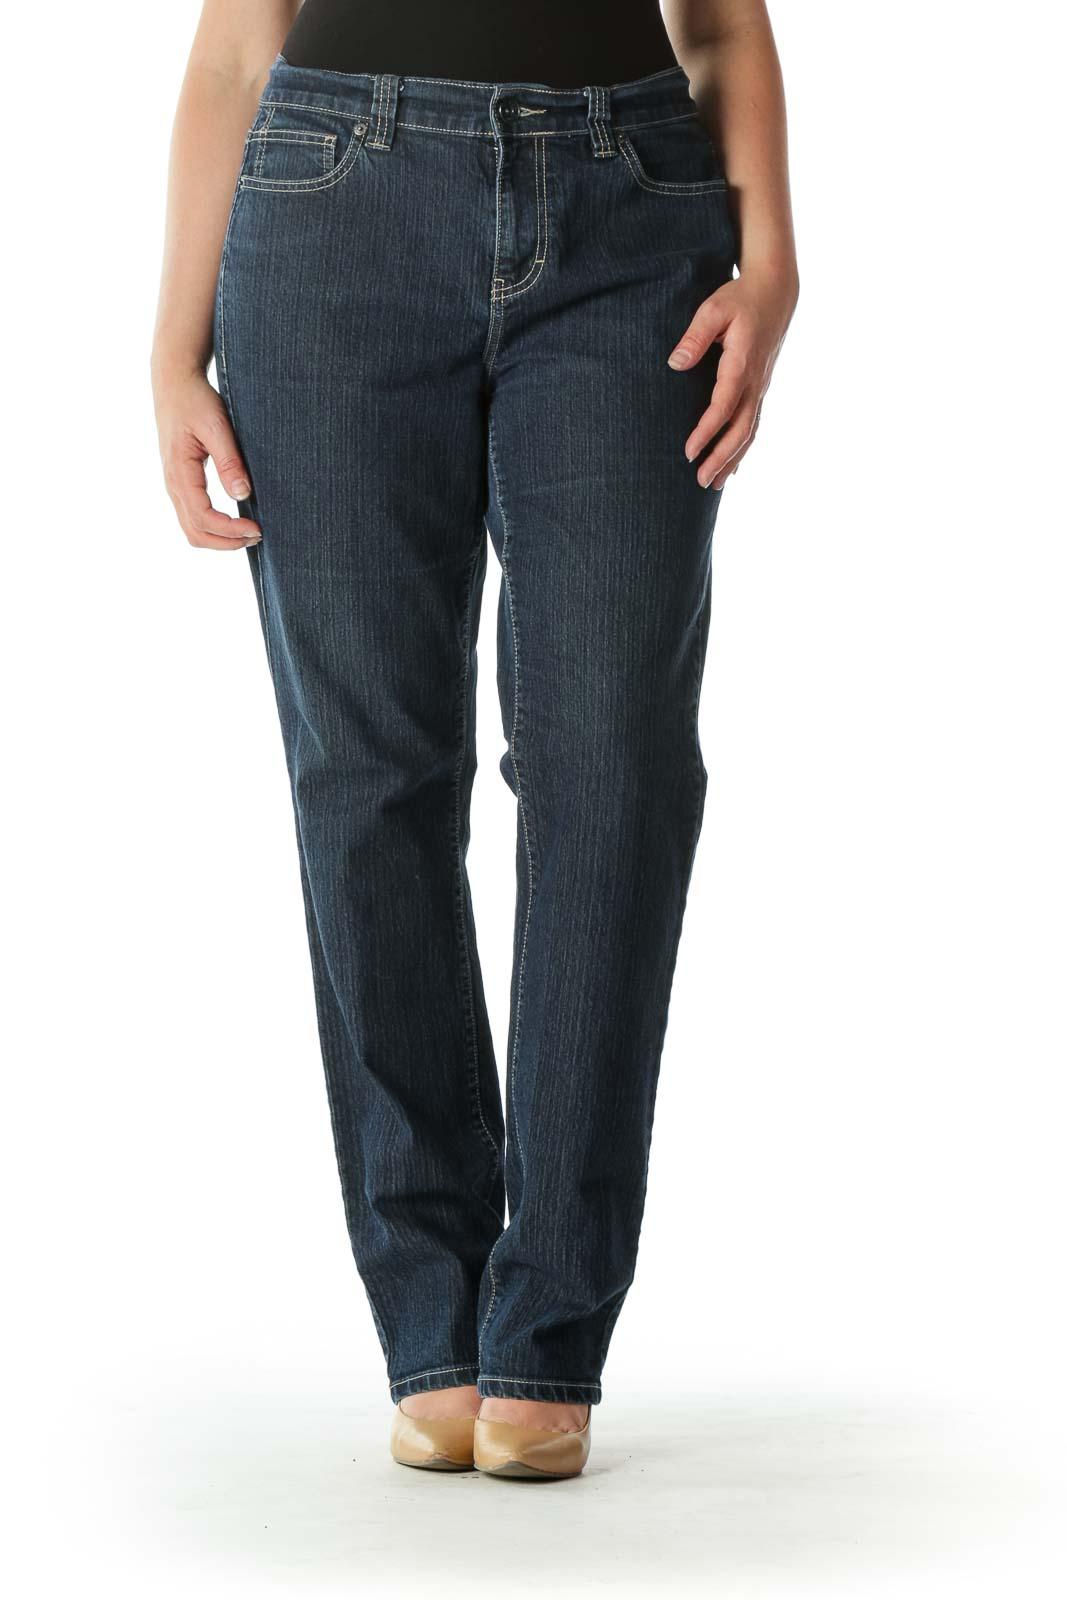 Blue Dark-Wash Stretch Skinny Denim Jeans Front